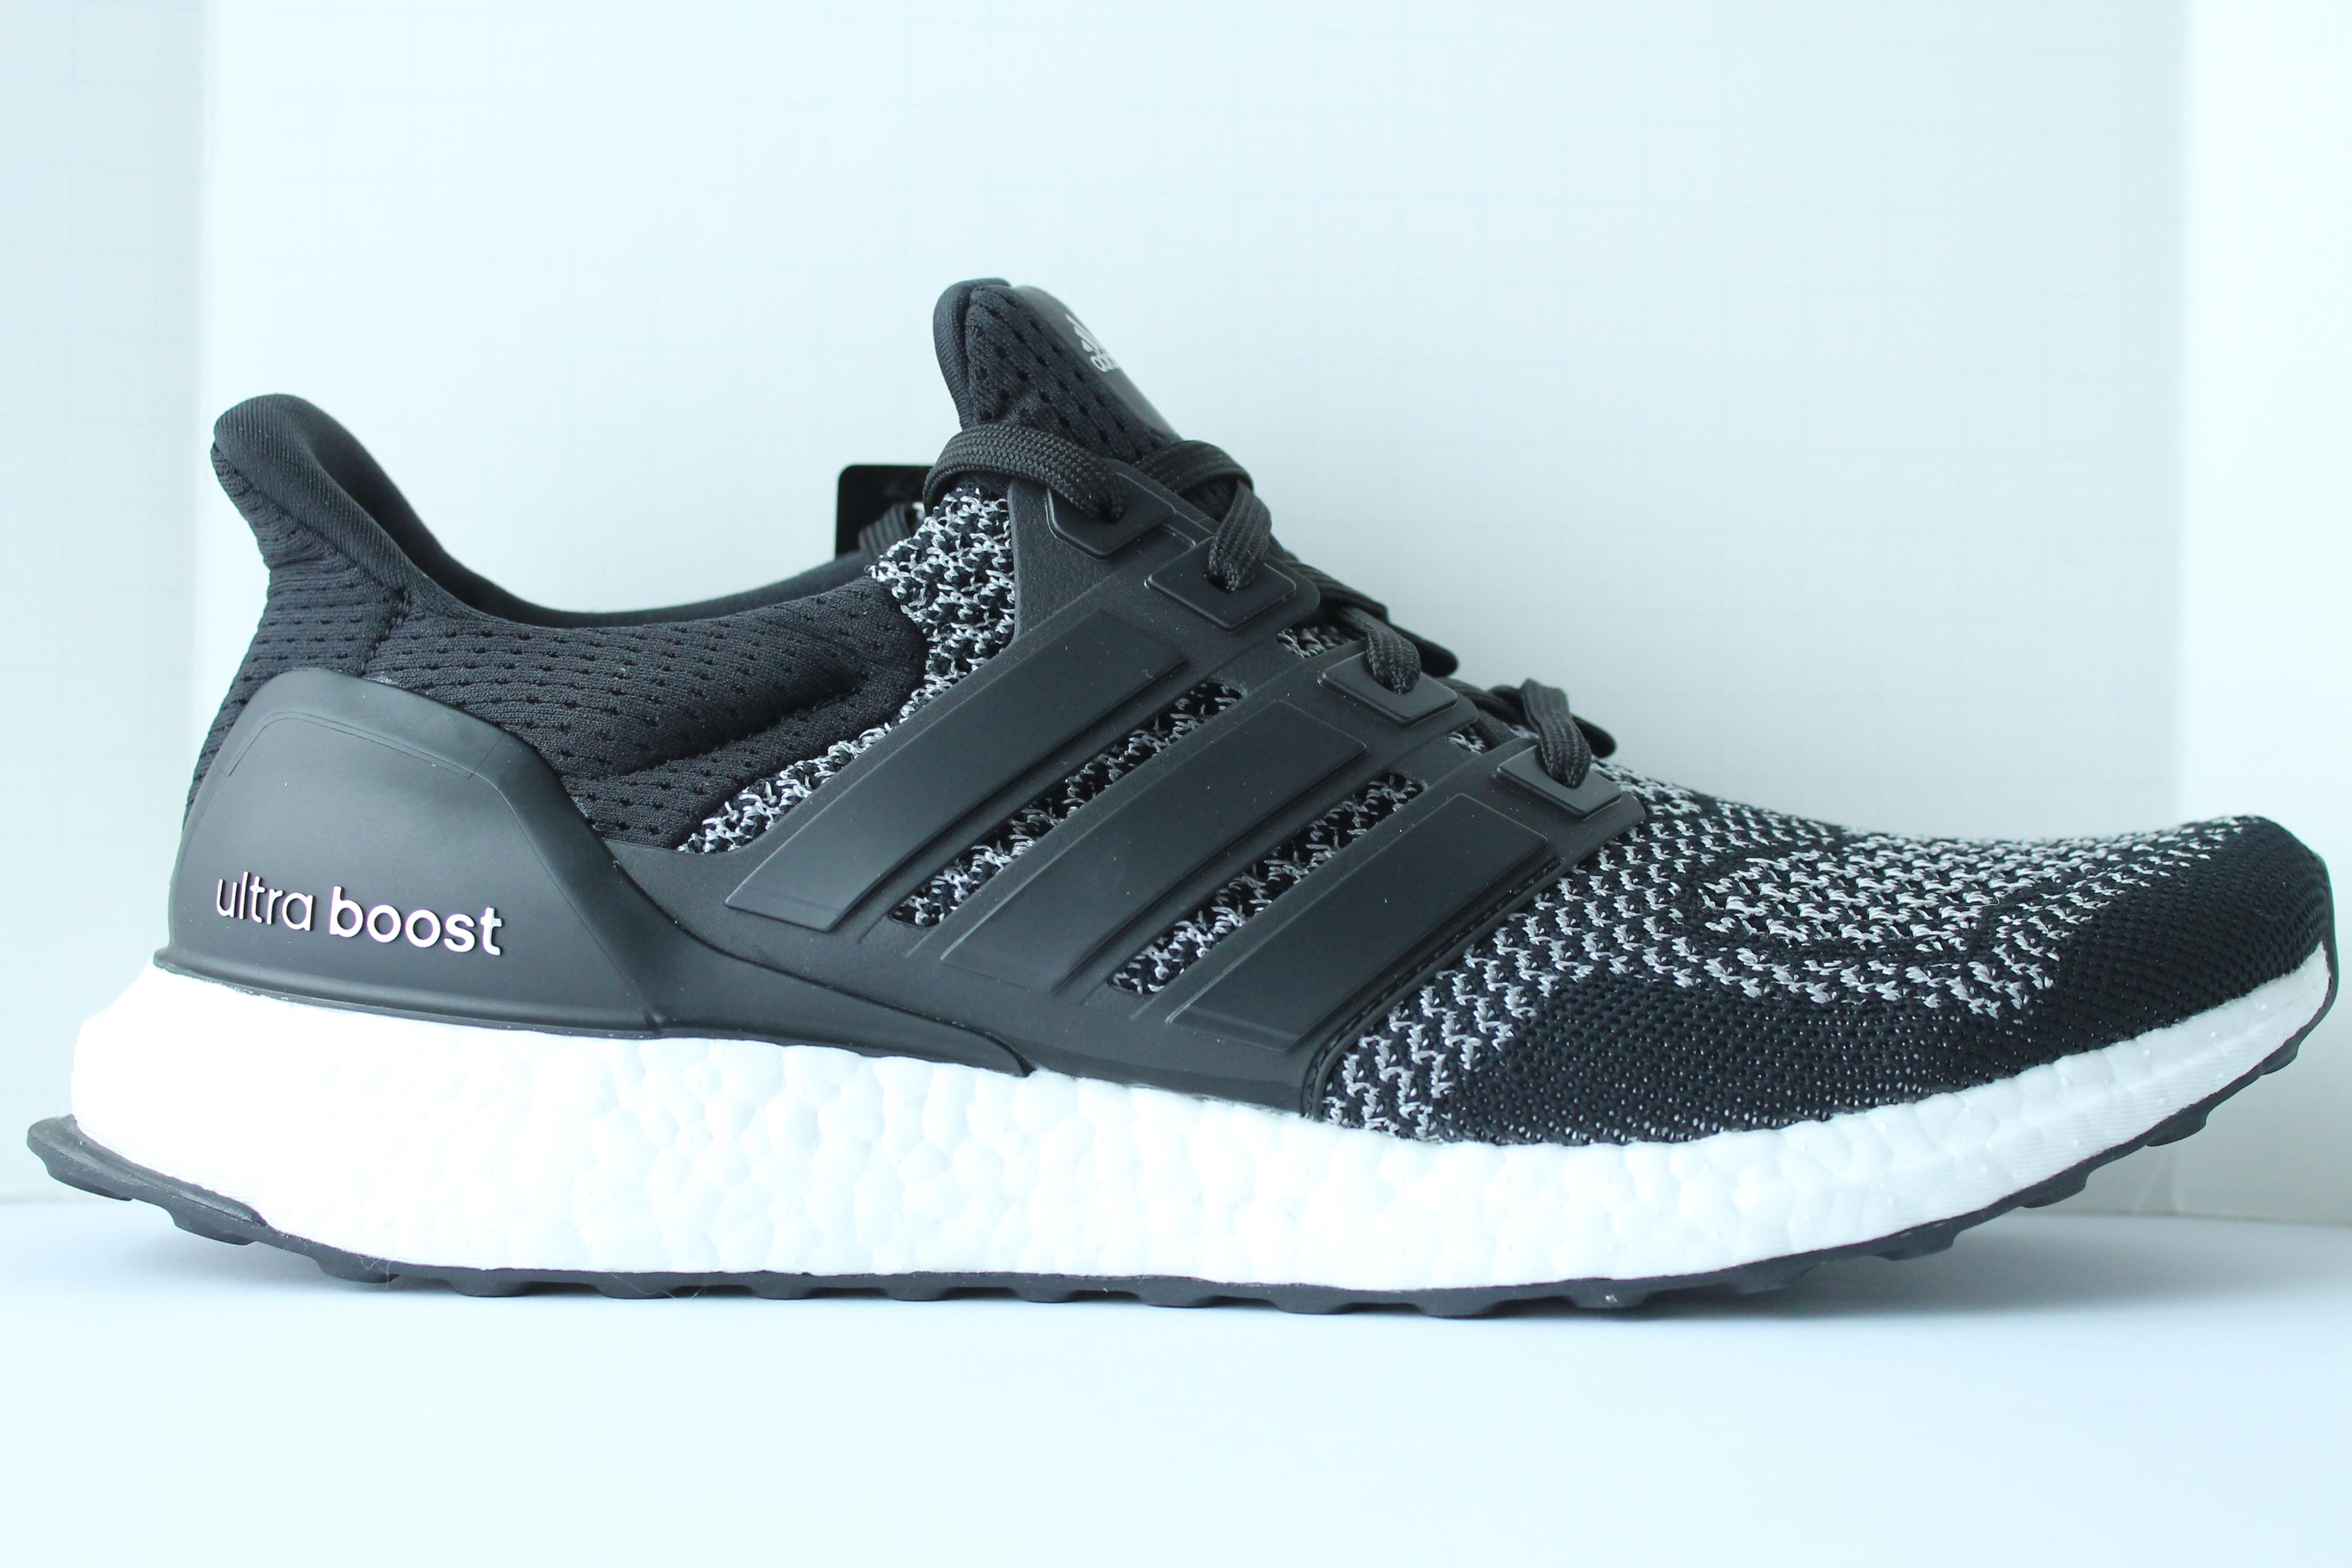 435f9739f73e4 Adidas Ultra Boost LTD - 3M Reflective Black